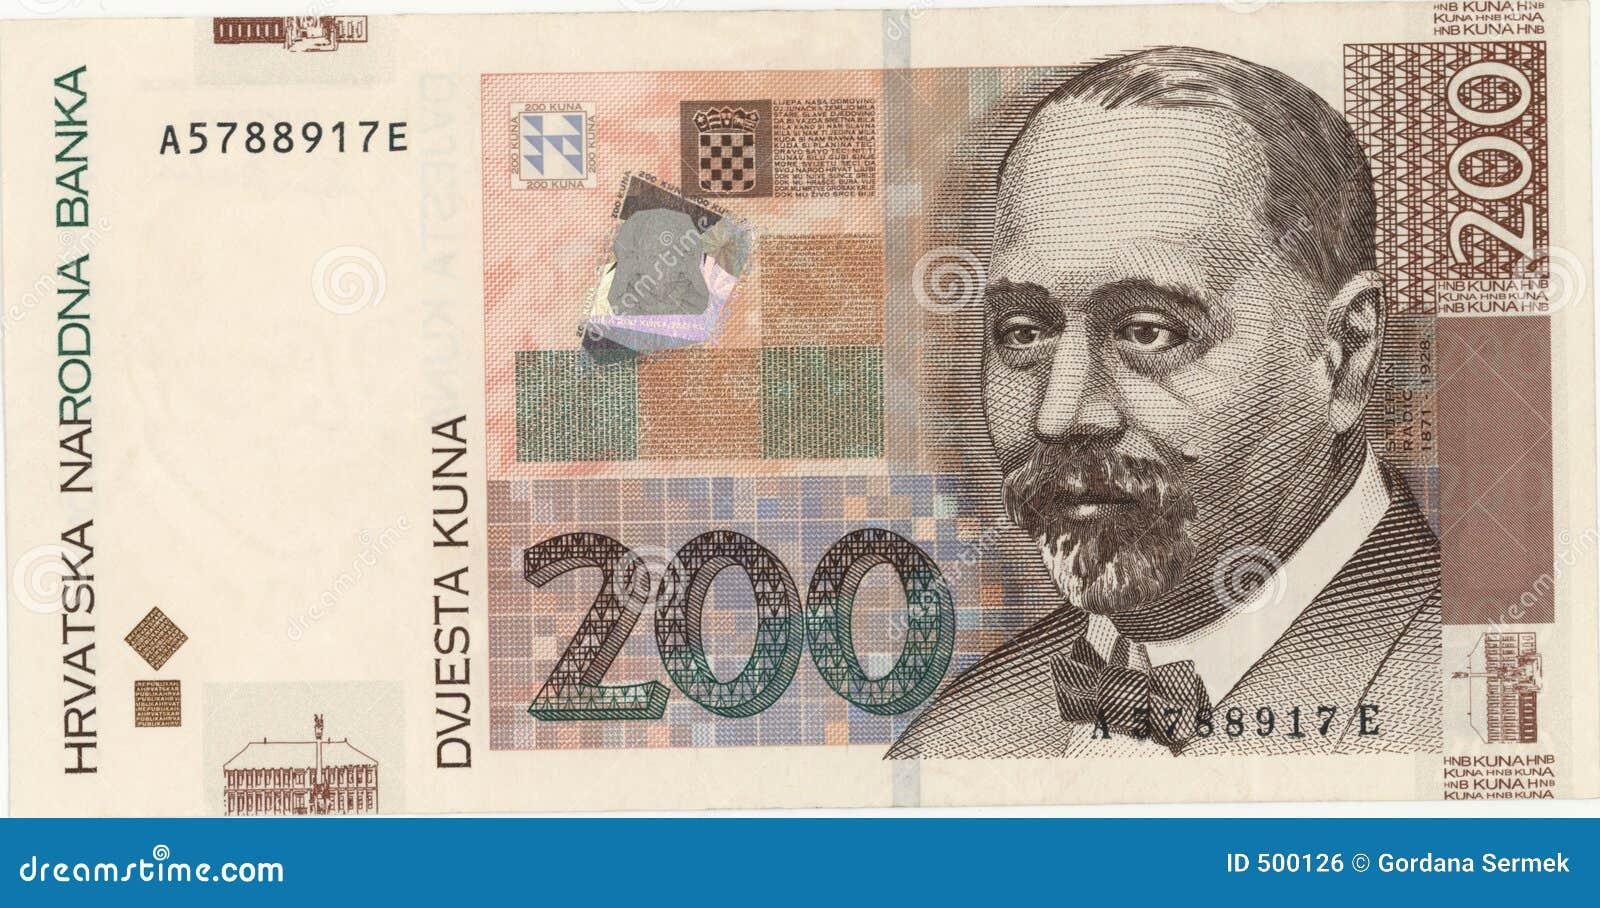 Kroatisk valuta